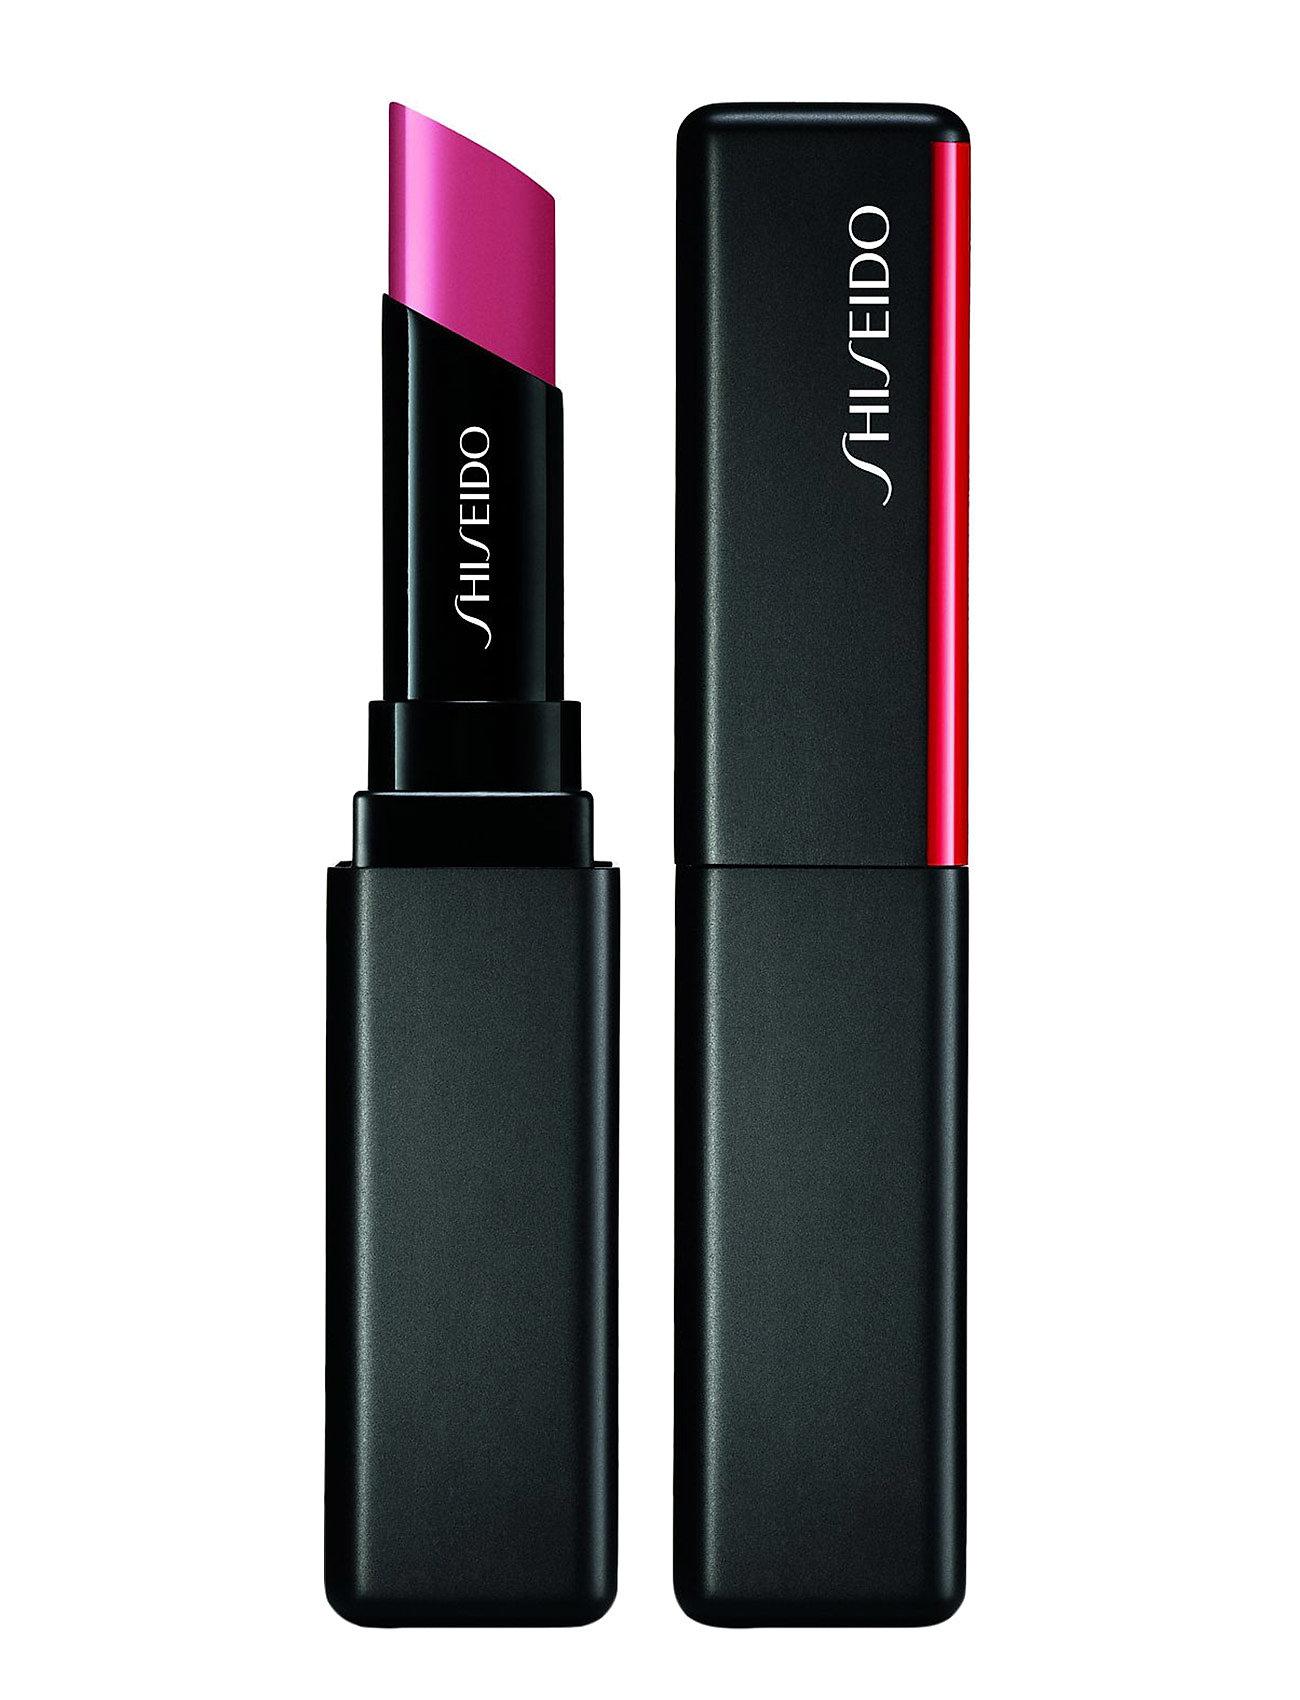 Image of Visionairy Gel Lipstick 210 J-Pop Læbestift Makeup Shiseido (3070276151)